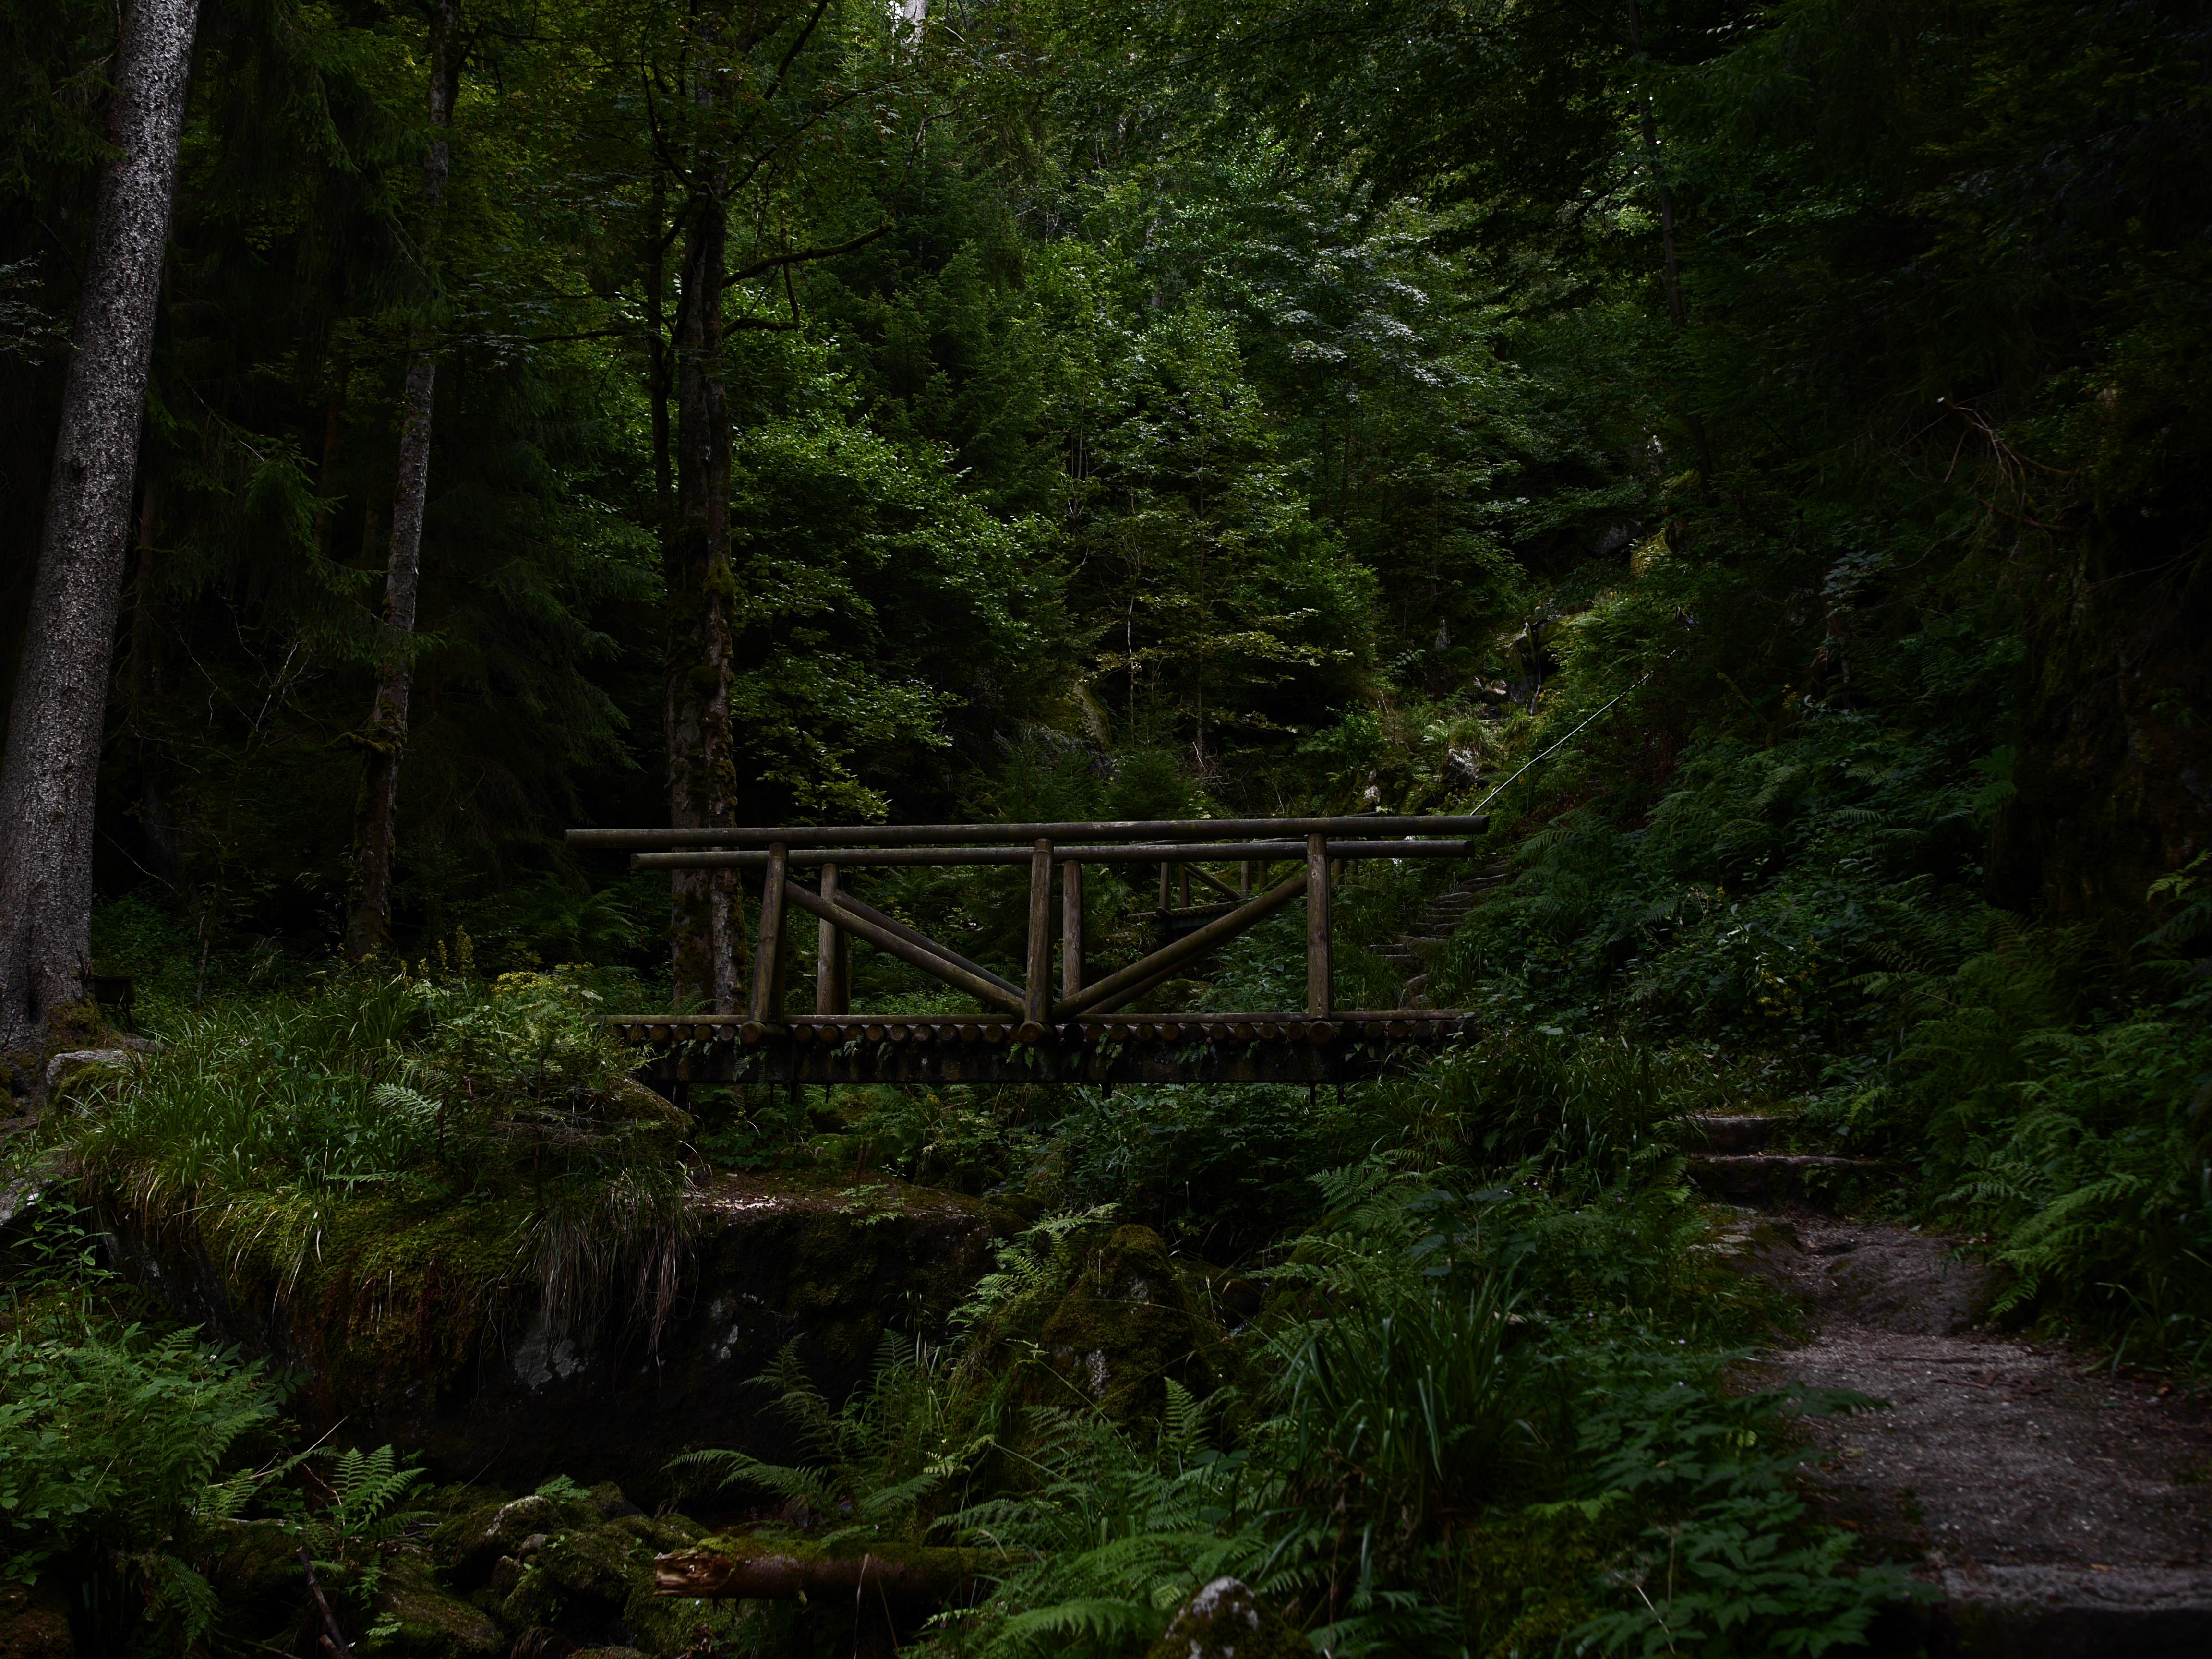 General 4608x3456 bridge forest nature